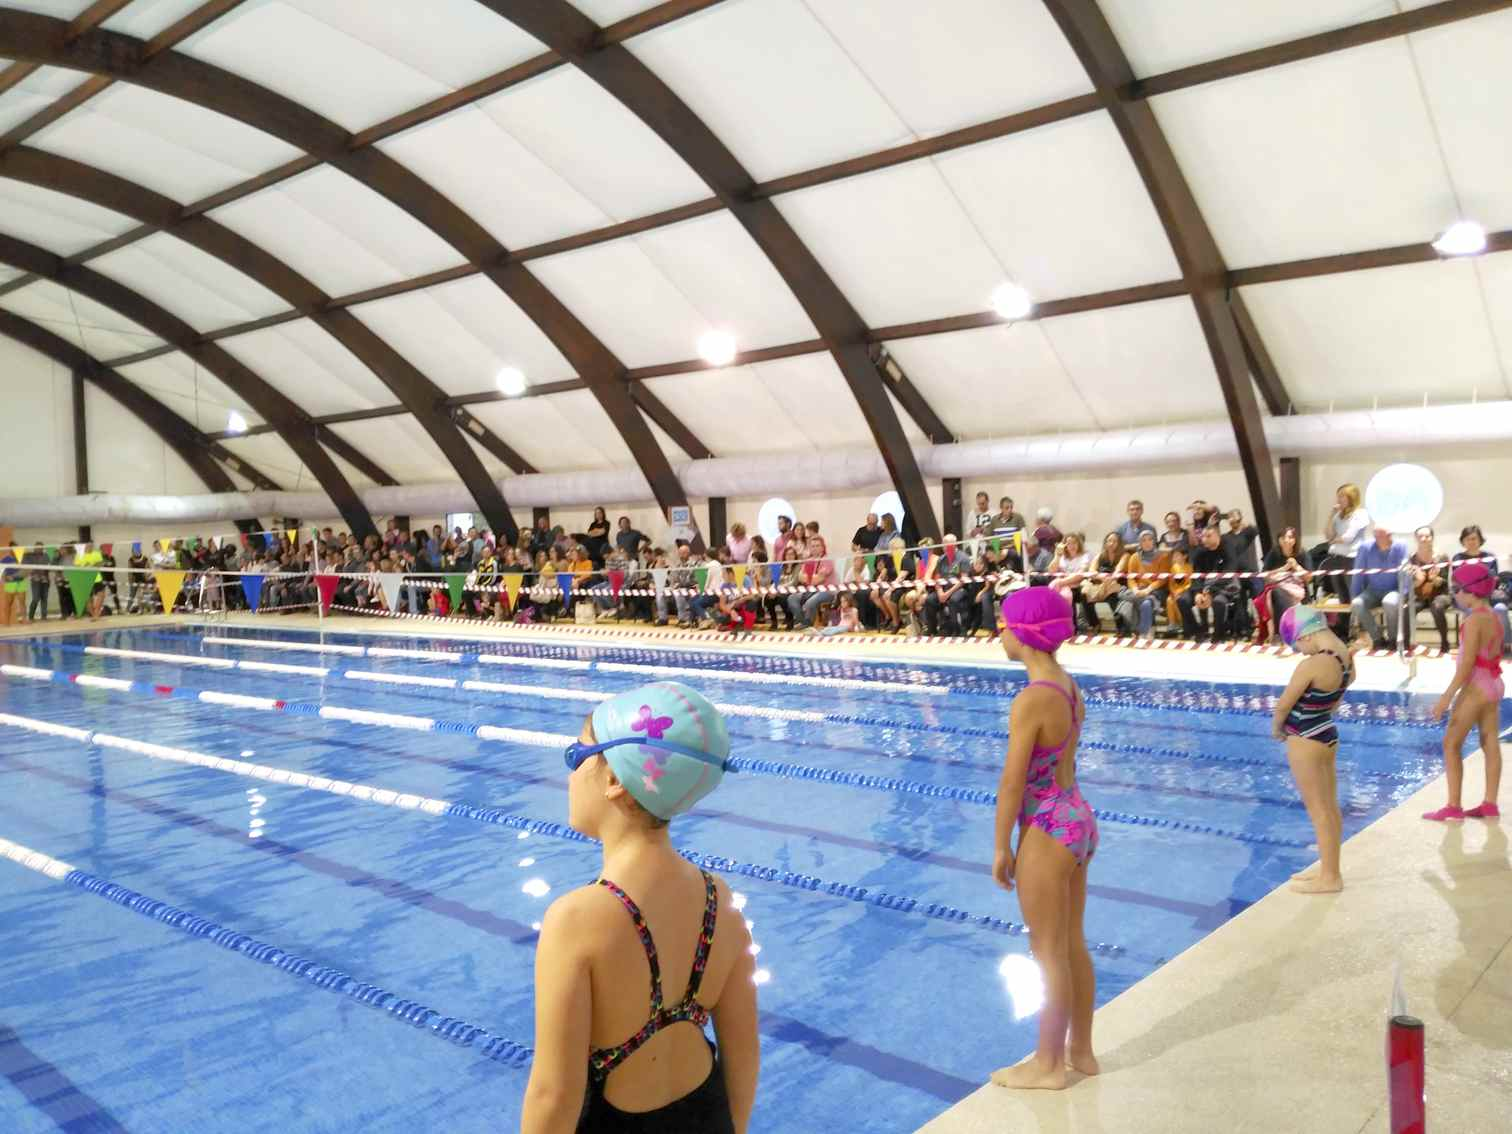 La piscina de Castalla acoge la primera jornada de la Liga Intercomarcal de Natación Ibi-Castalla-Alcoy